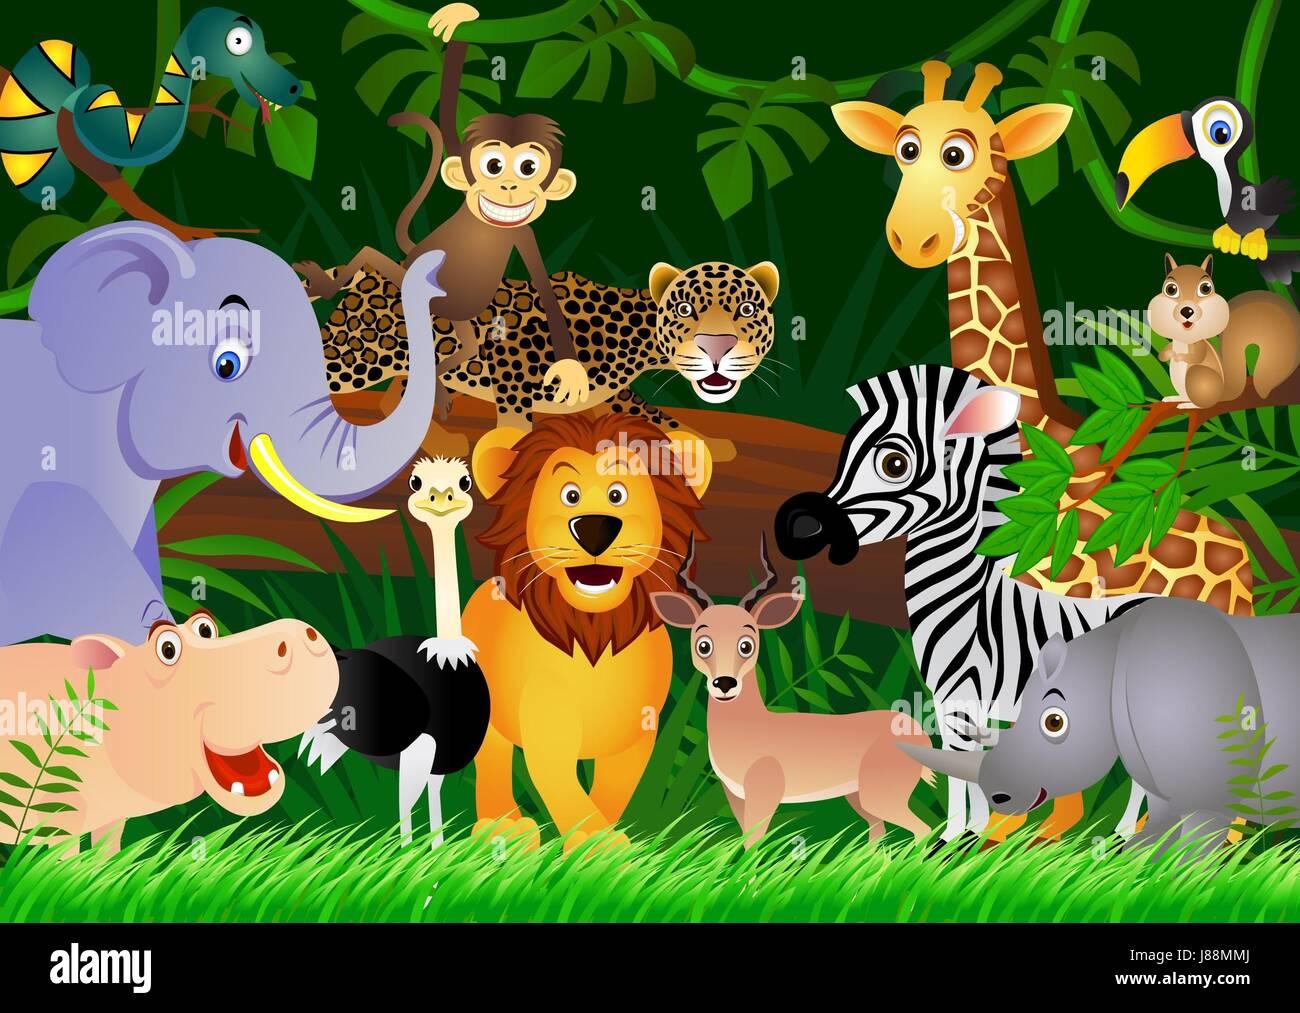 Safari Animal Wallpaper Animal Africa Jungle Illustration Safari Cartoon